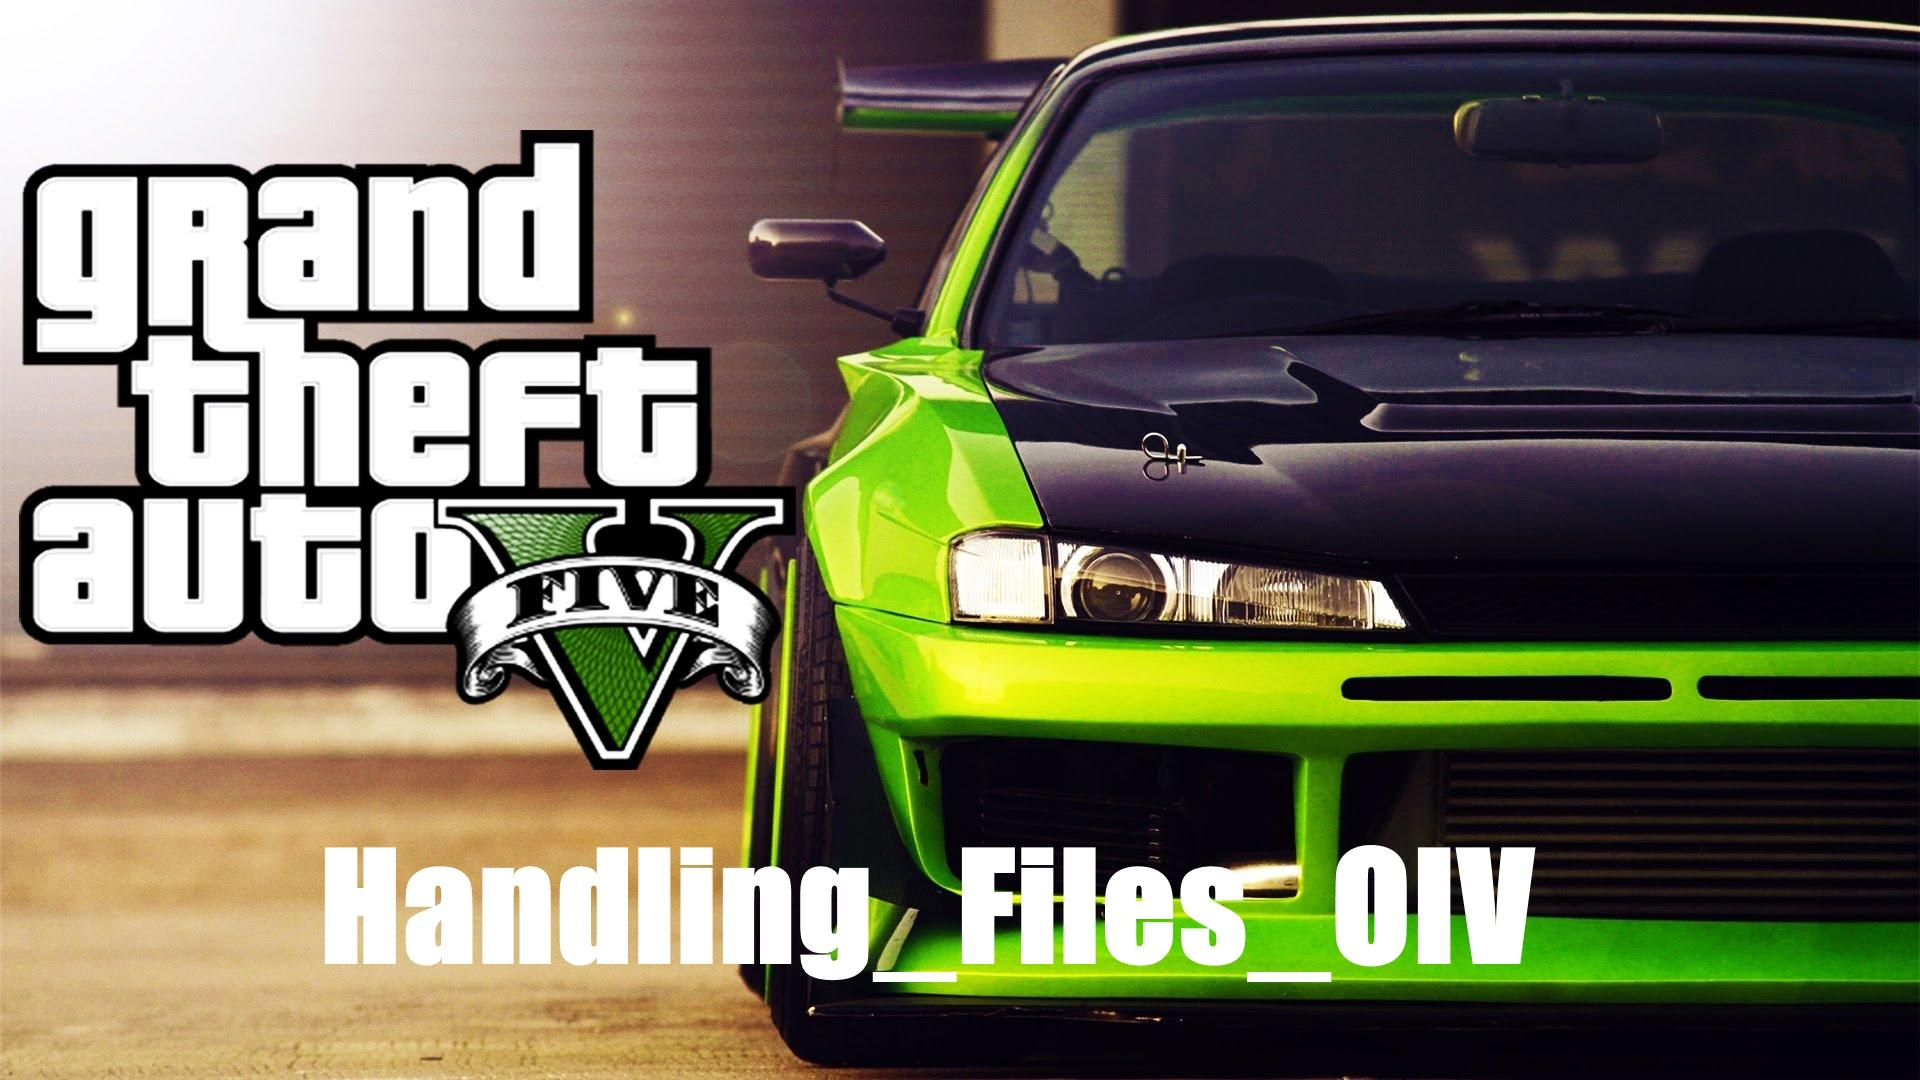 Handling_Files_OIV